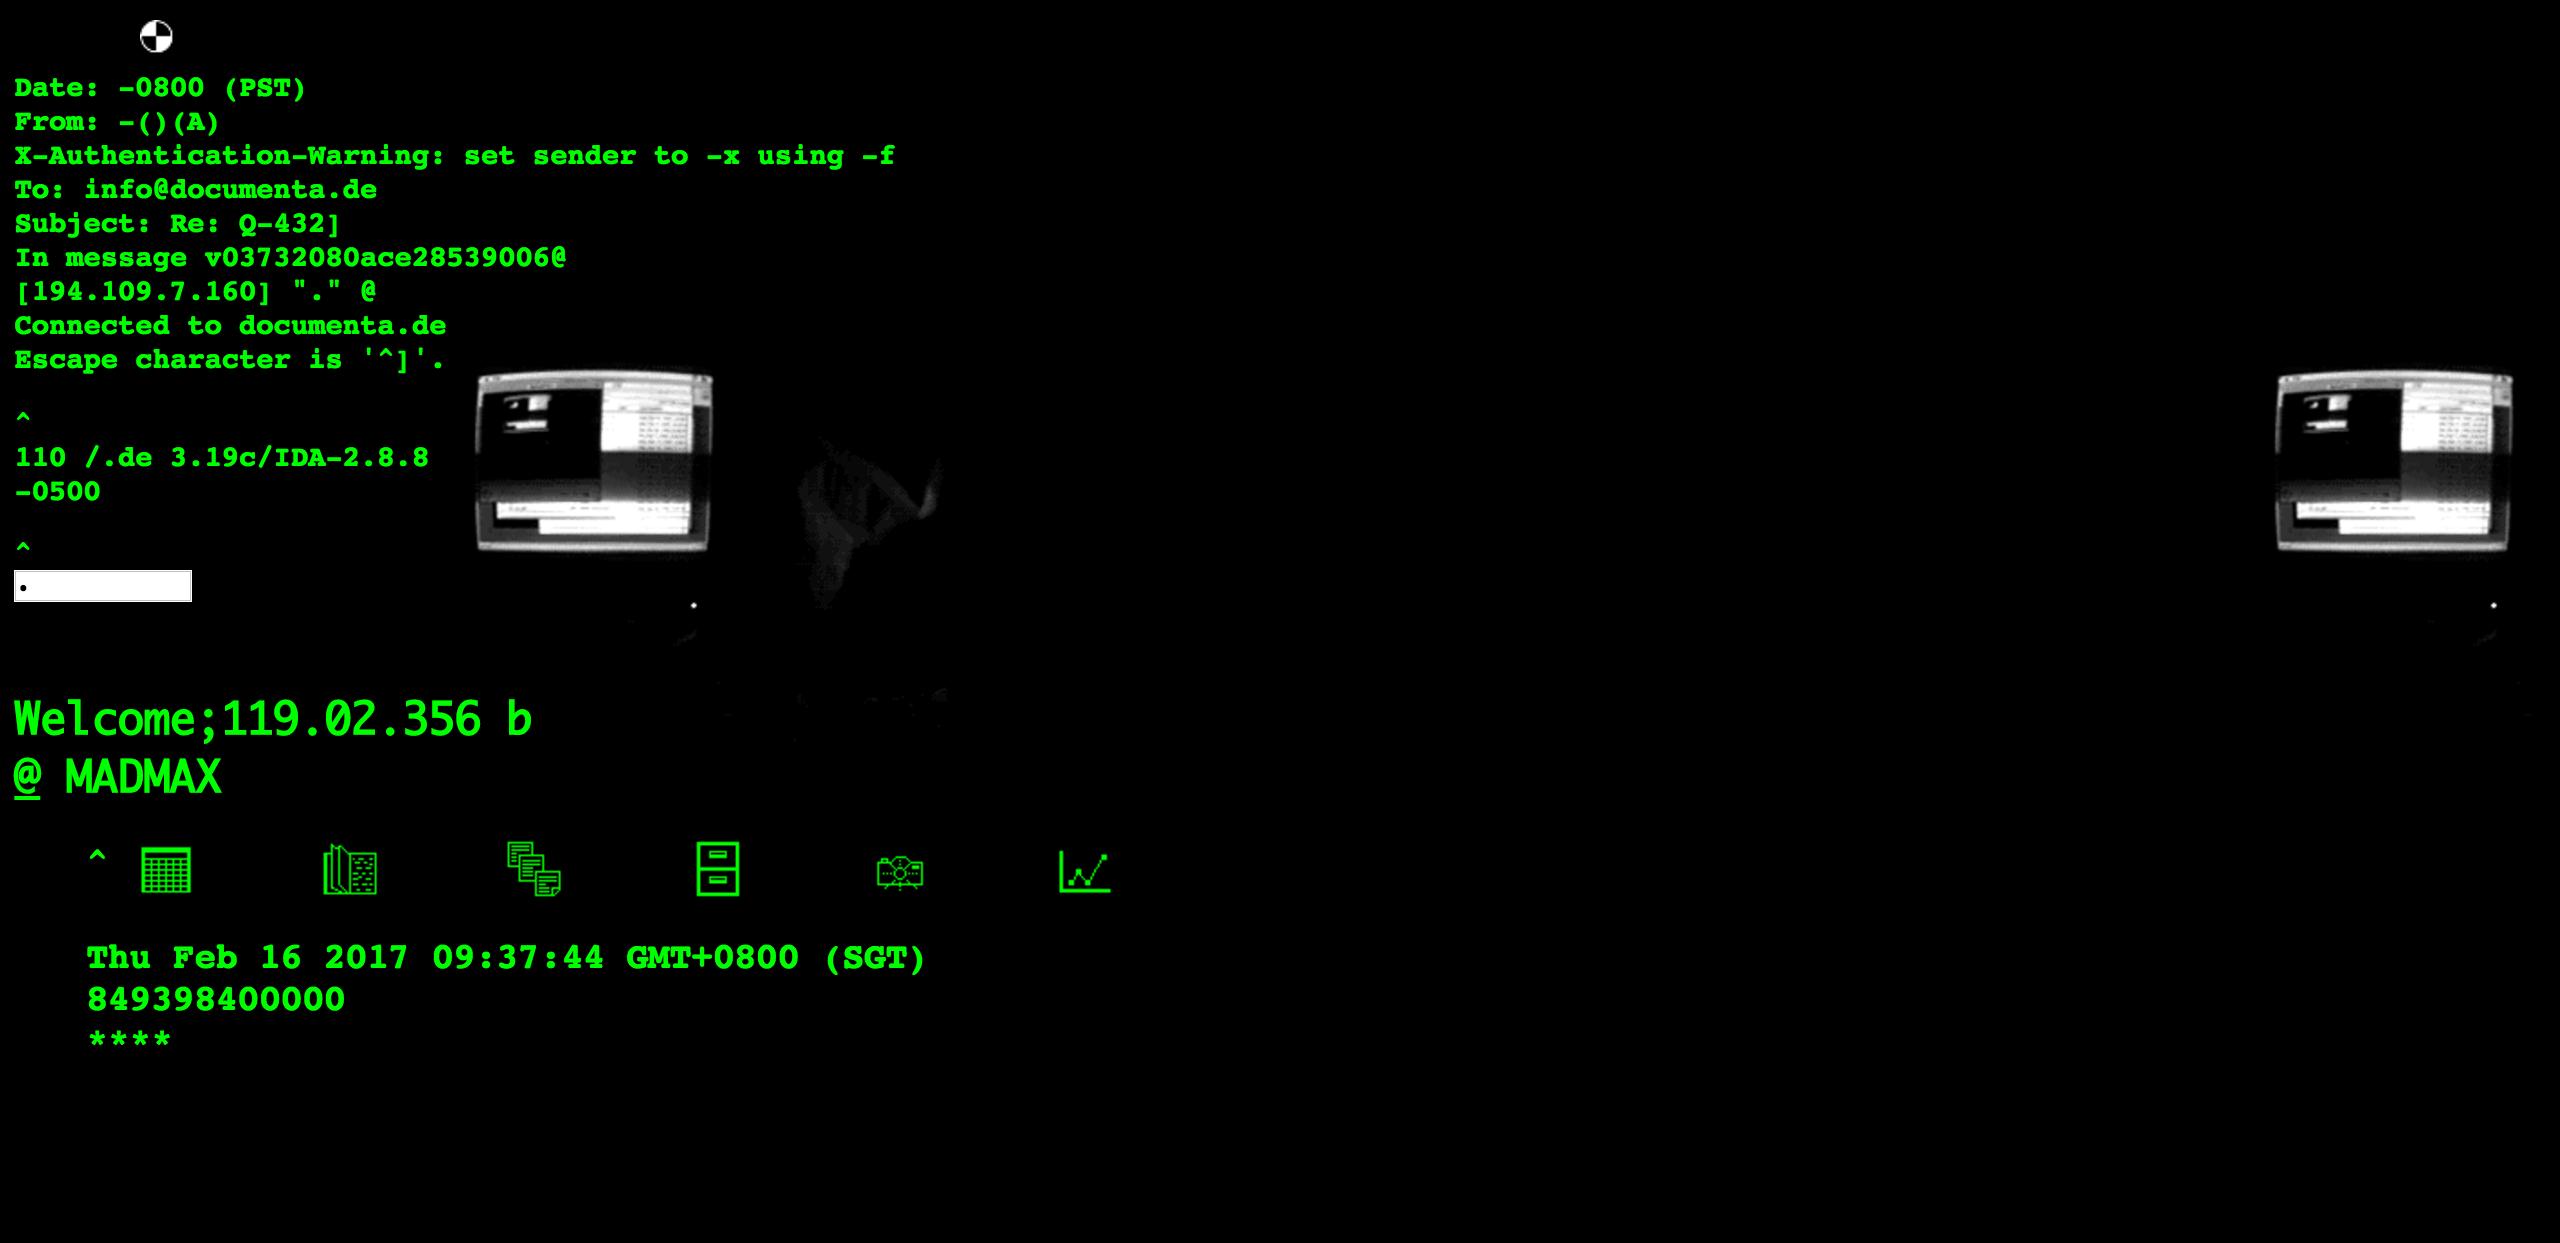 Screenshot of 'Jodi.org' by Jodi (Joan Heemskerk and Dirk Paesmans)